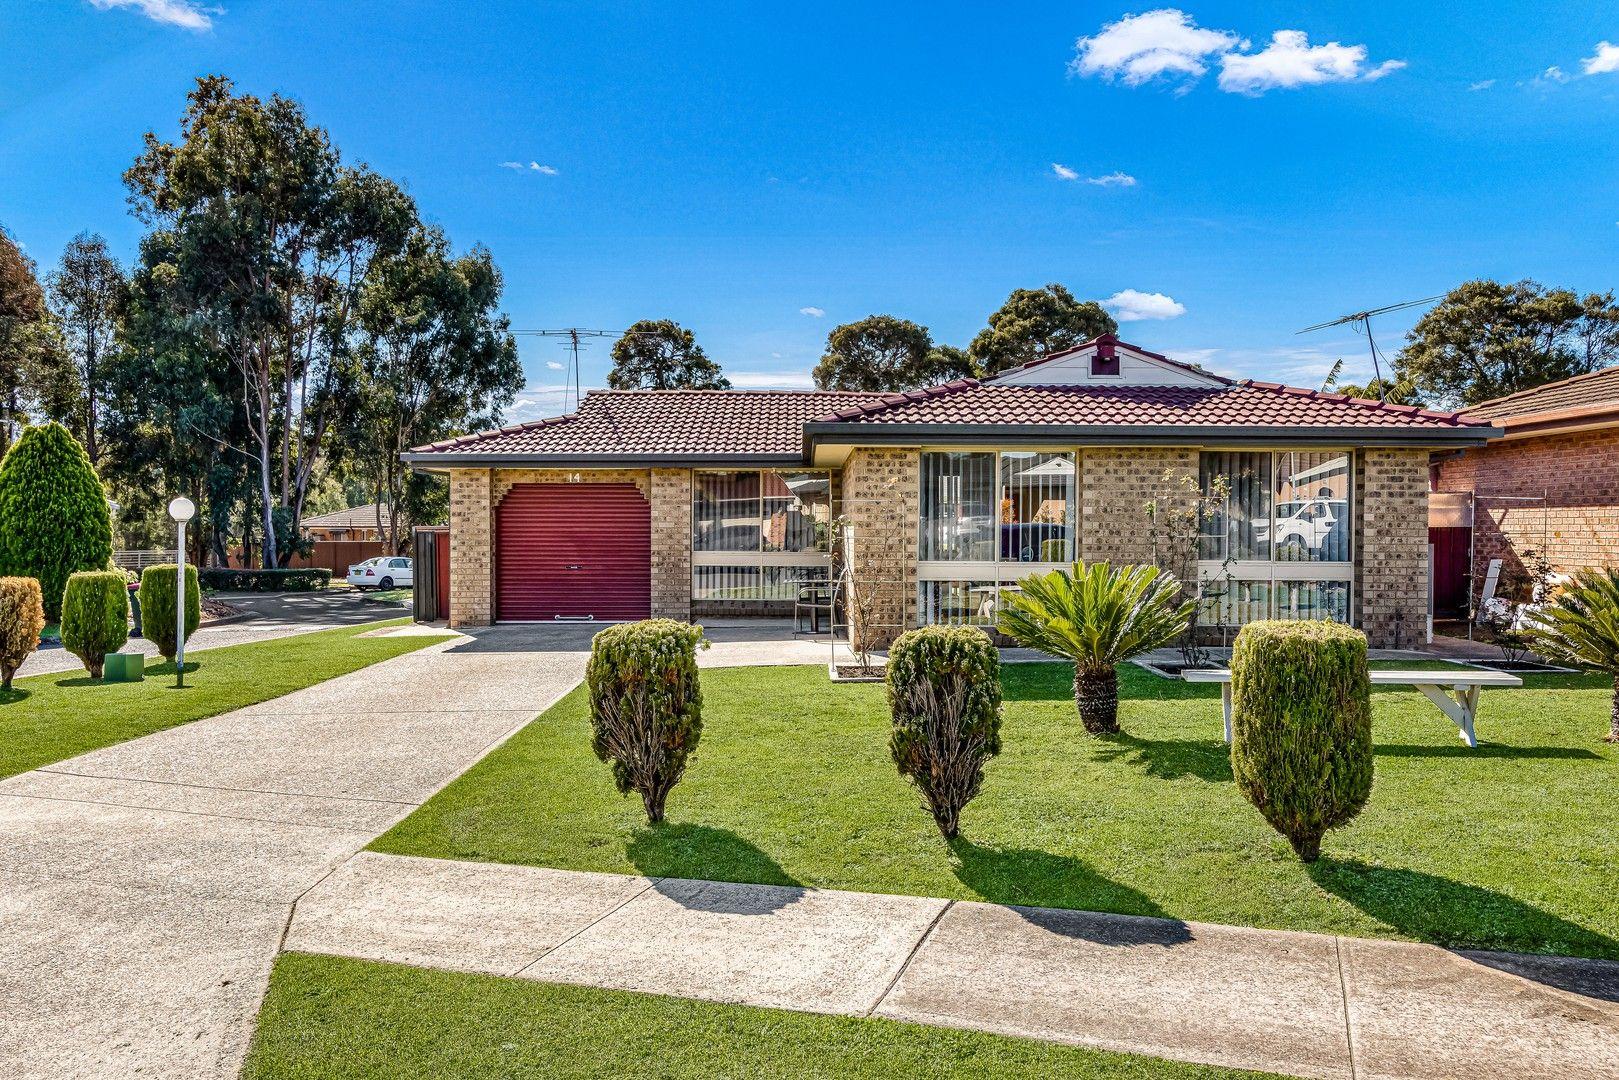 14/30 Devenish Street, Greenfield Park NSW 2176, Image 0